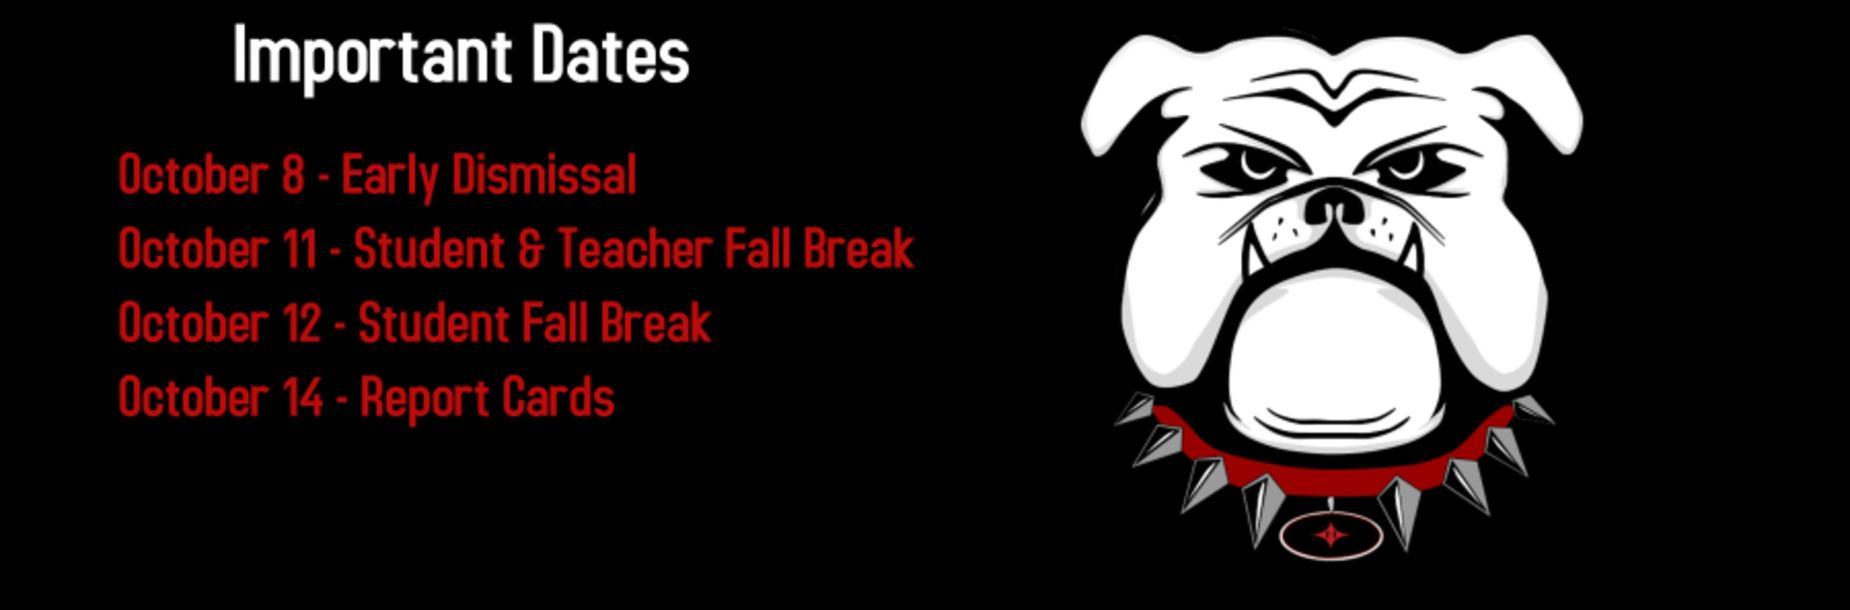 Oct. Important Dates